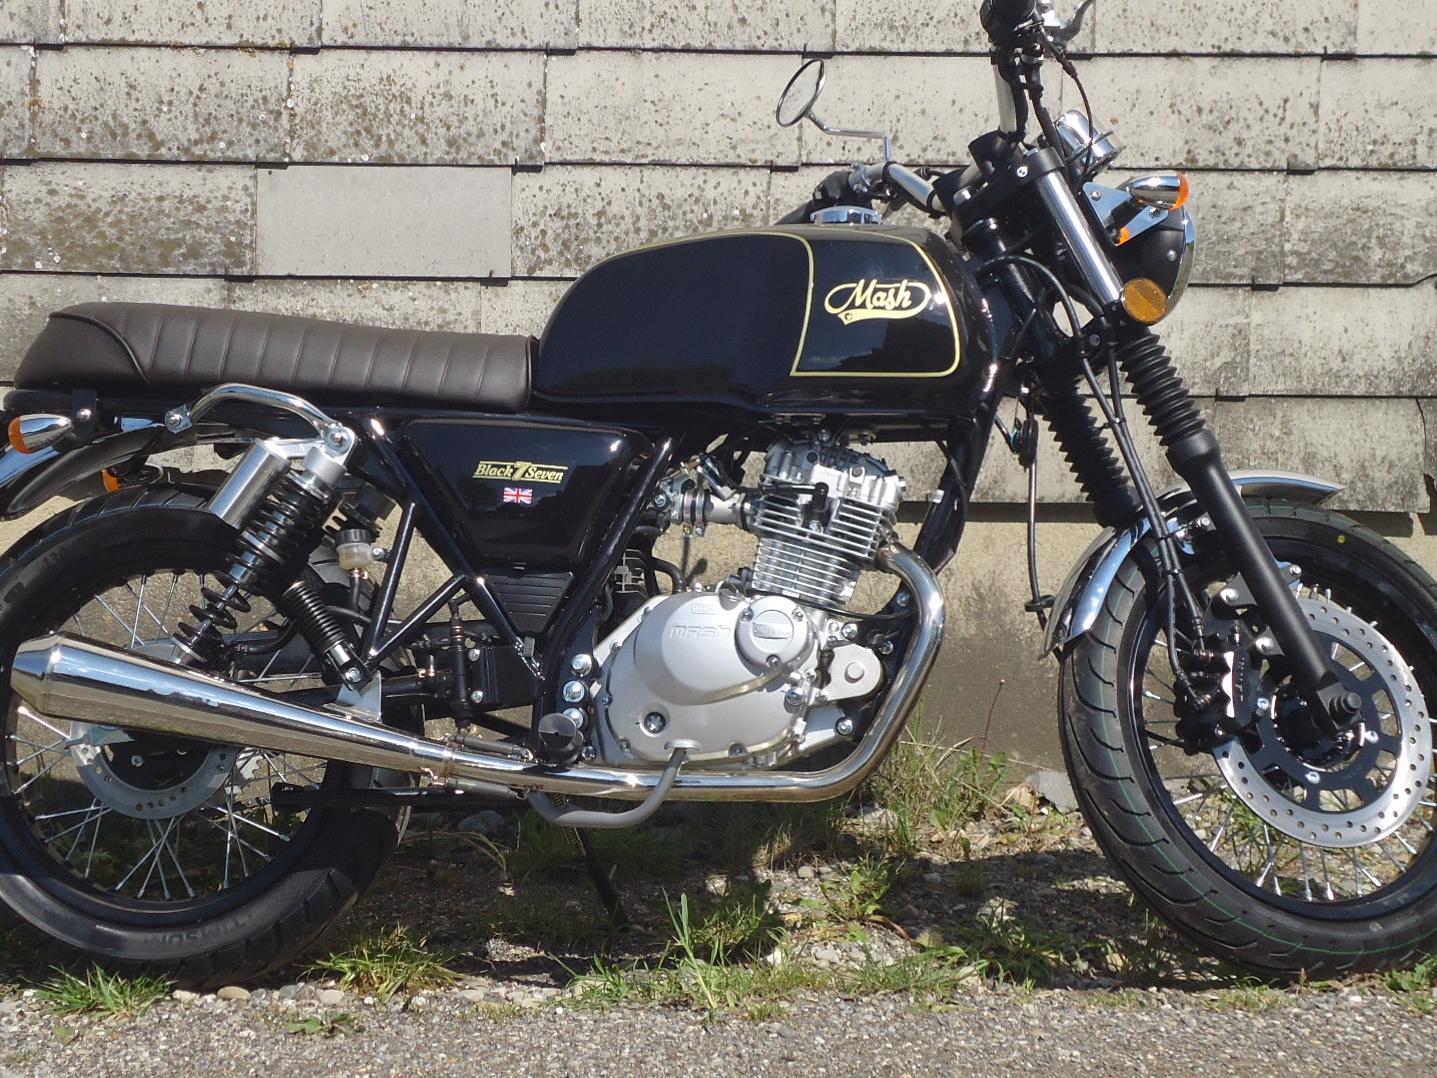 Mash 125 Black Seven schwarz-gold